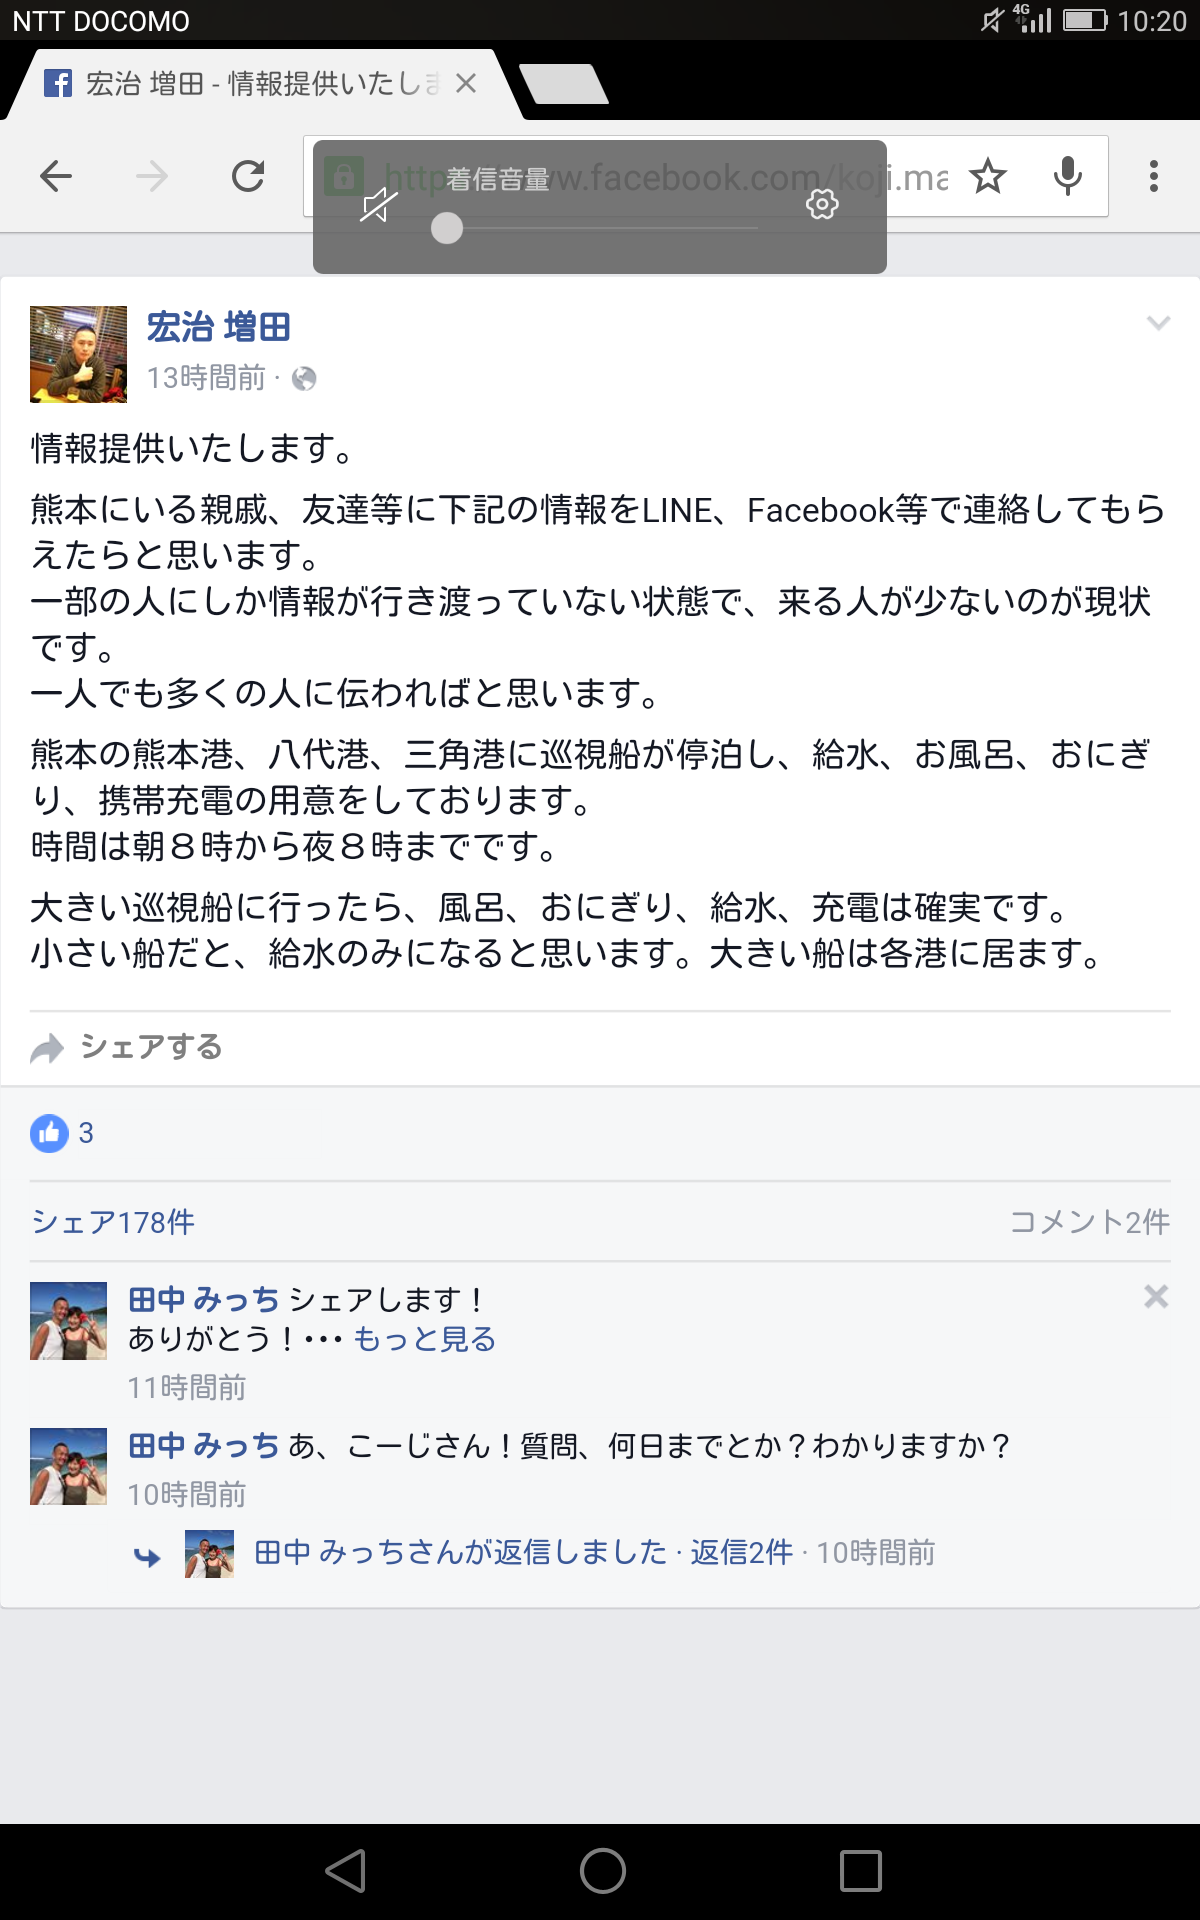 Screenshot_2016-04-19-10-20-30.png